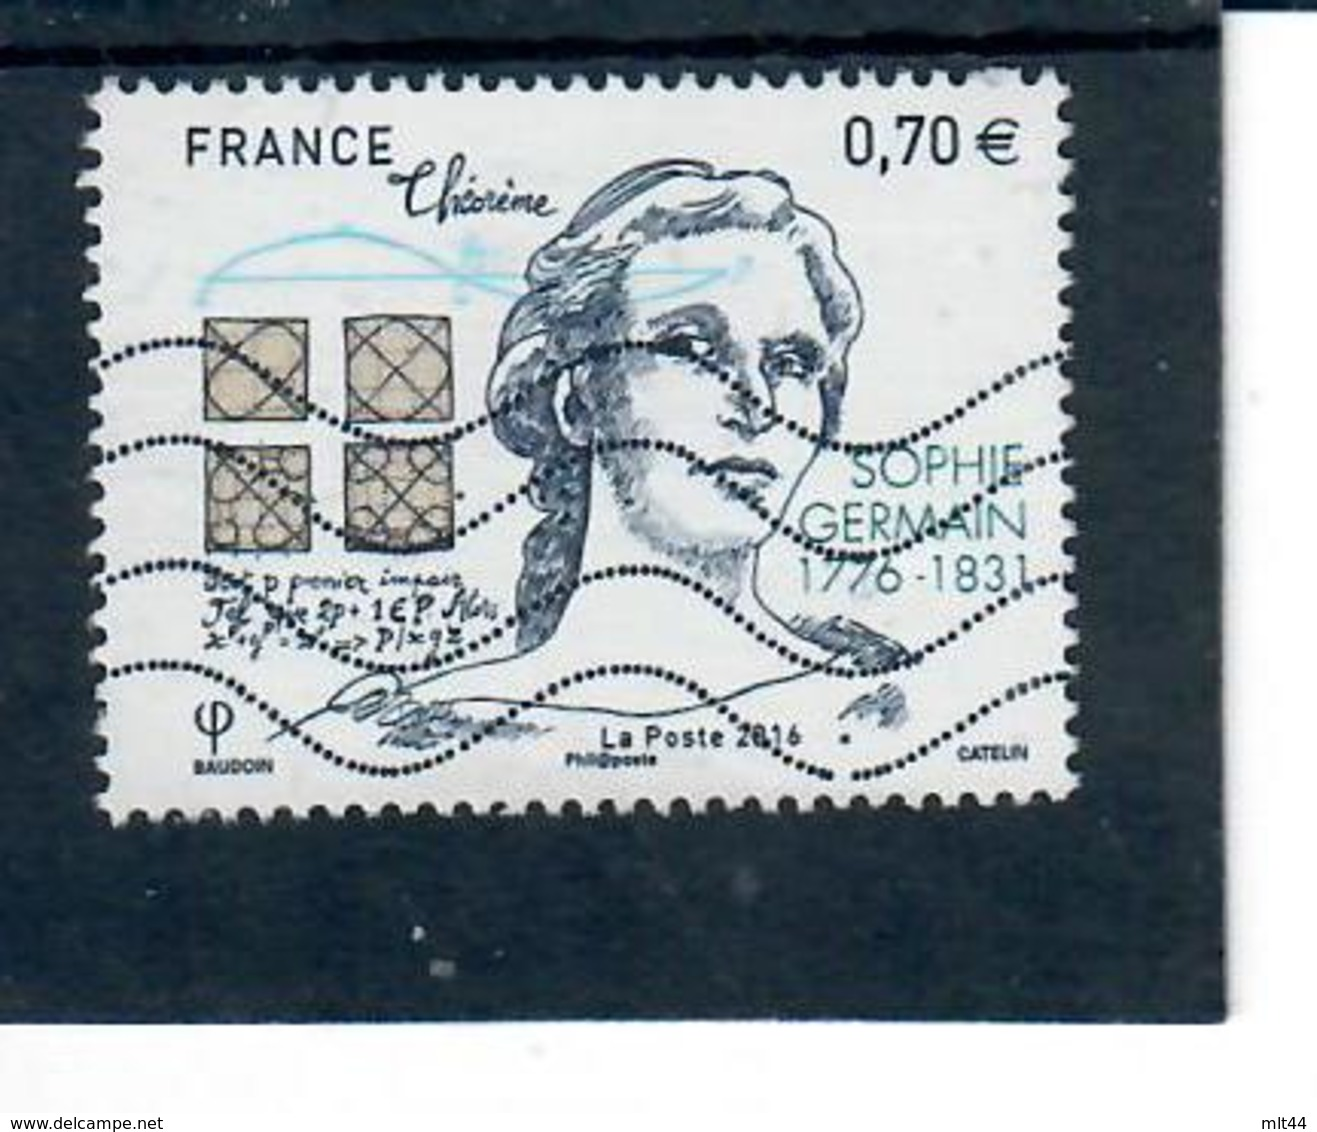 Yt 5036 Sophie Germain - France